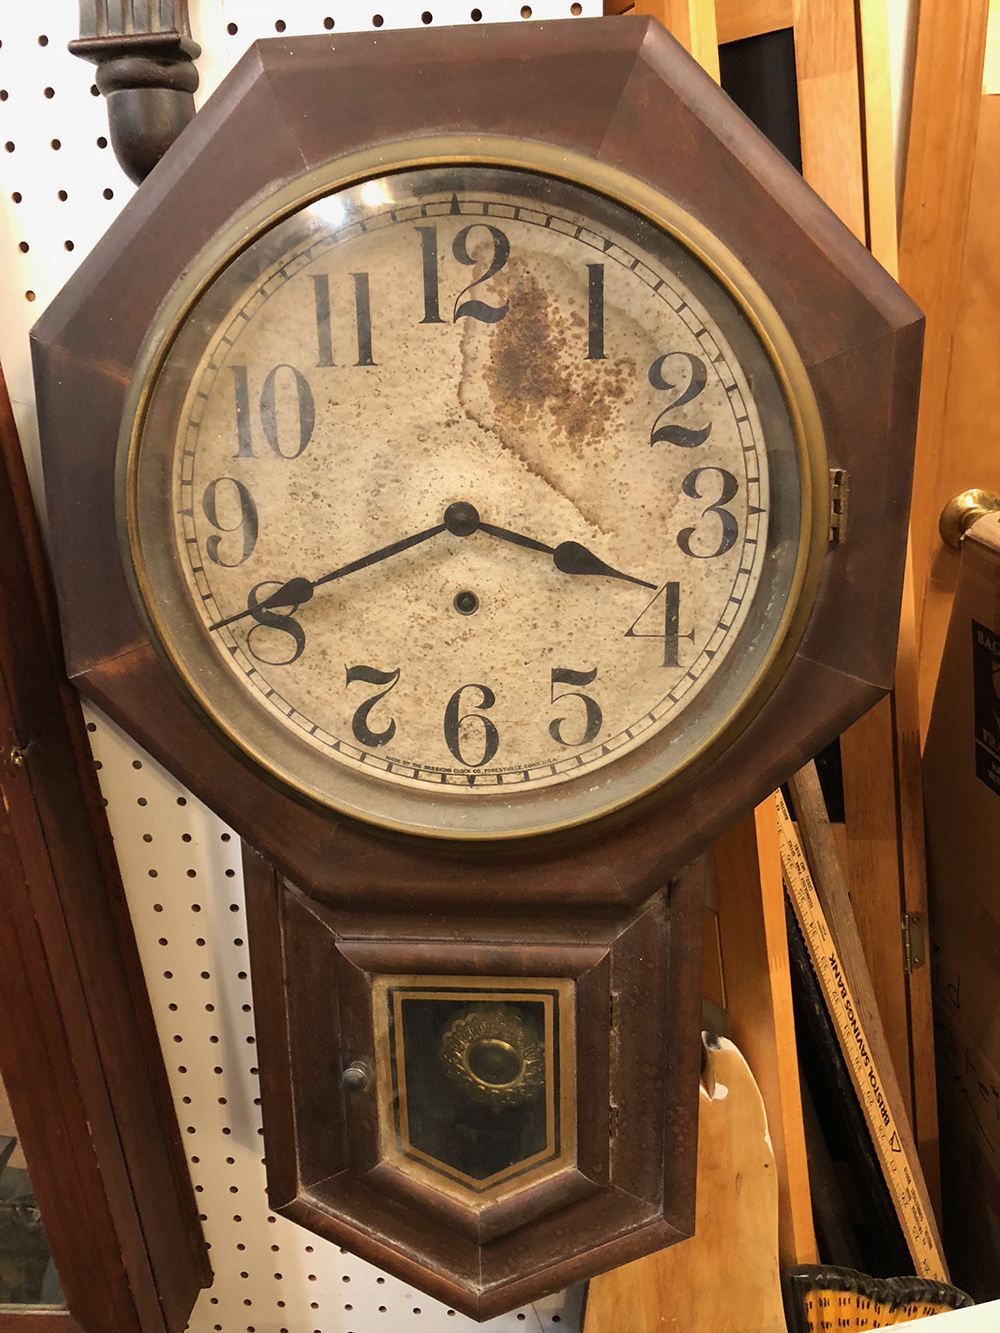 Clinton Regulator Clock by Sessions Clock Co.